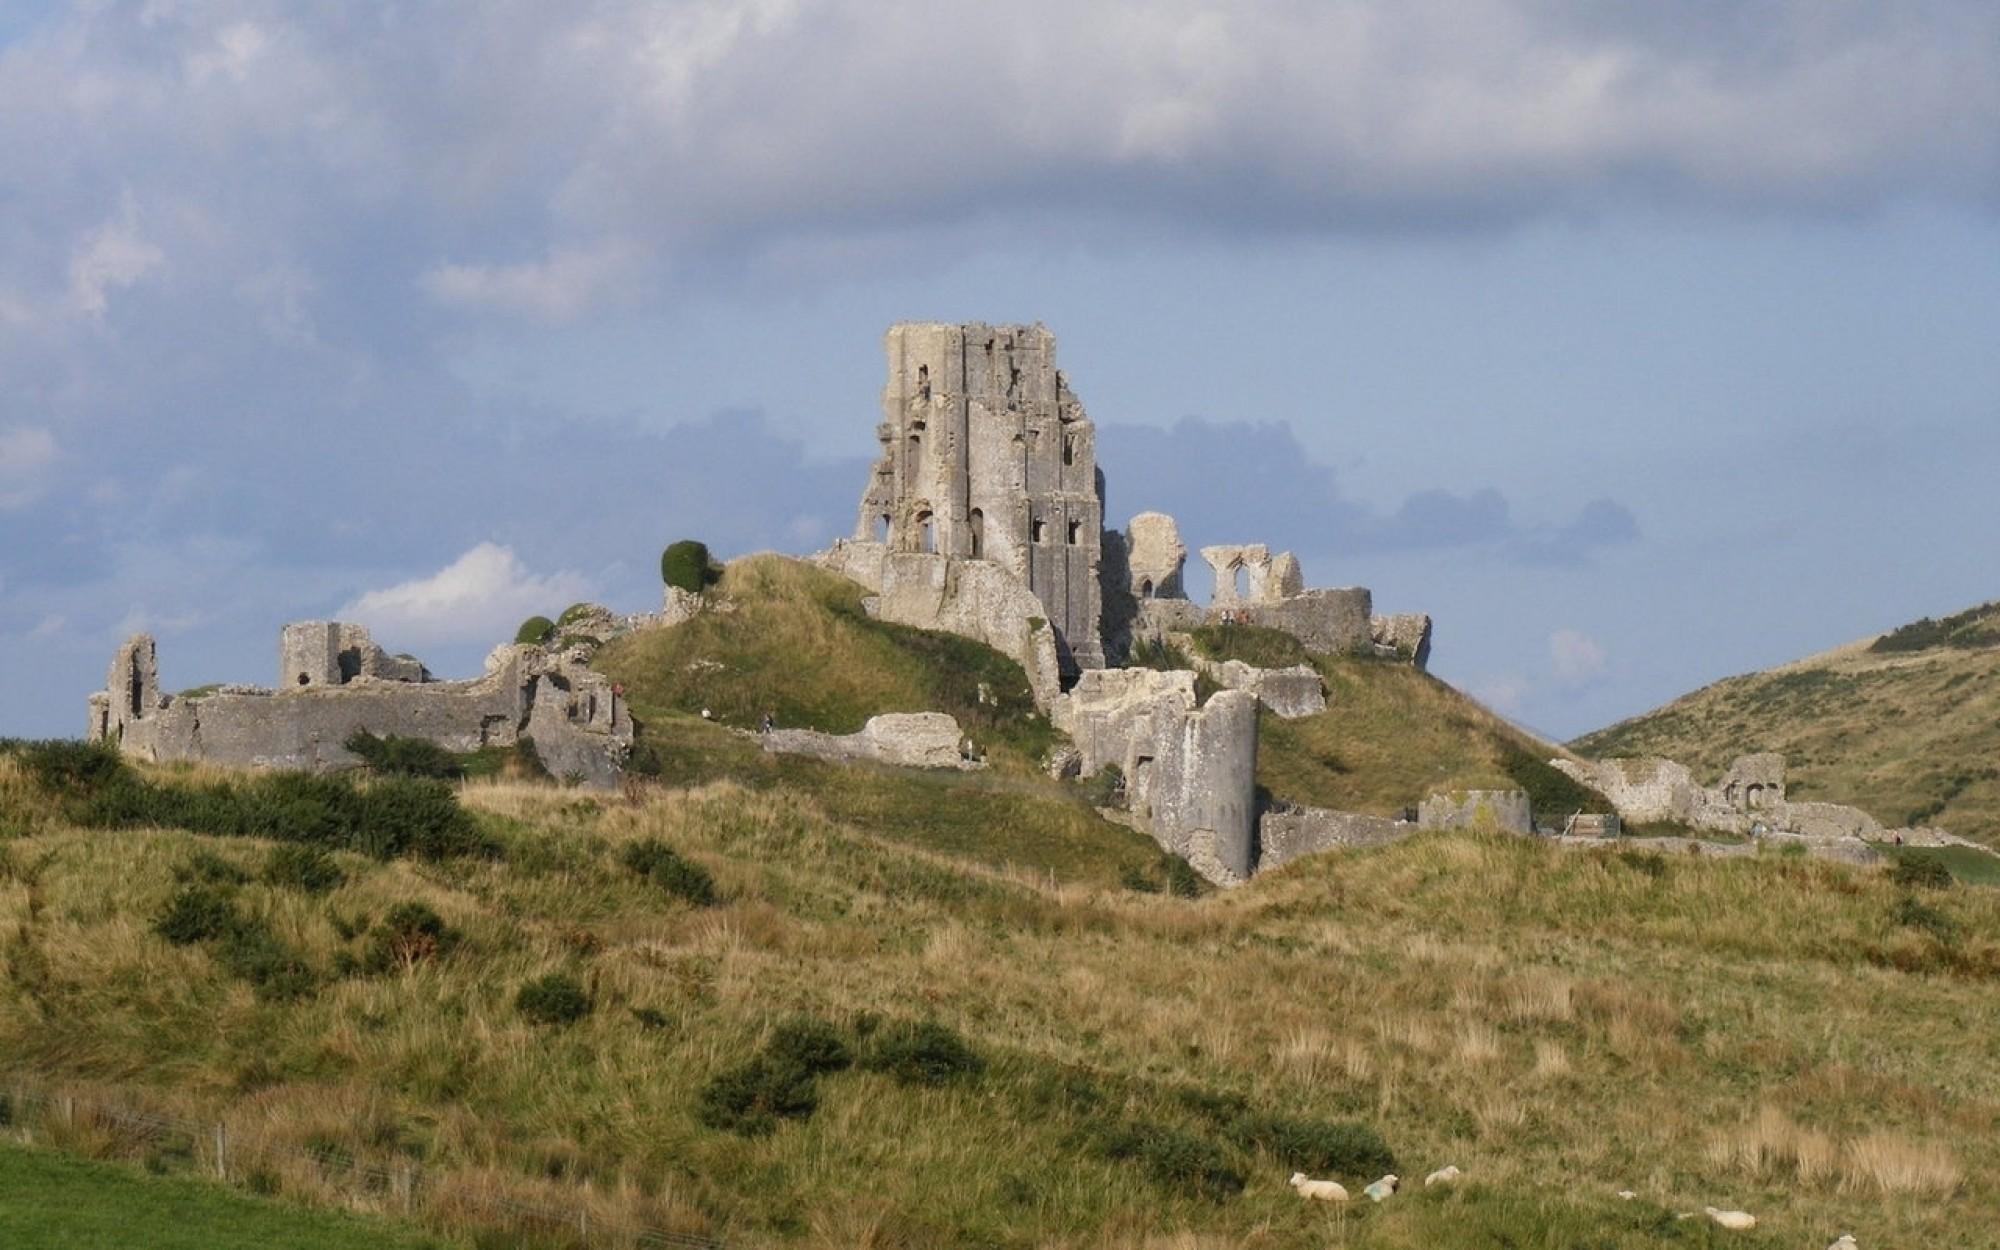 Corfe-castle-1208201-1280x960